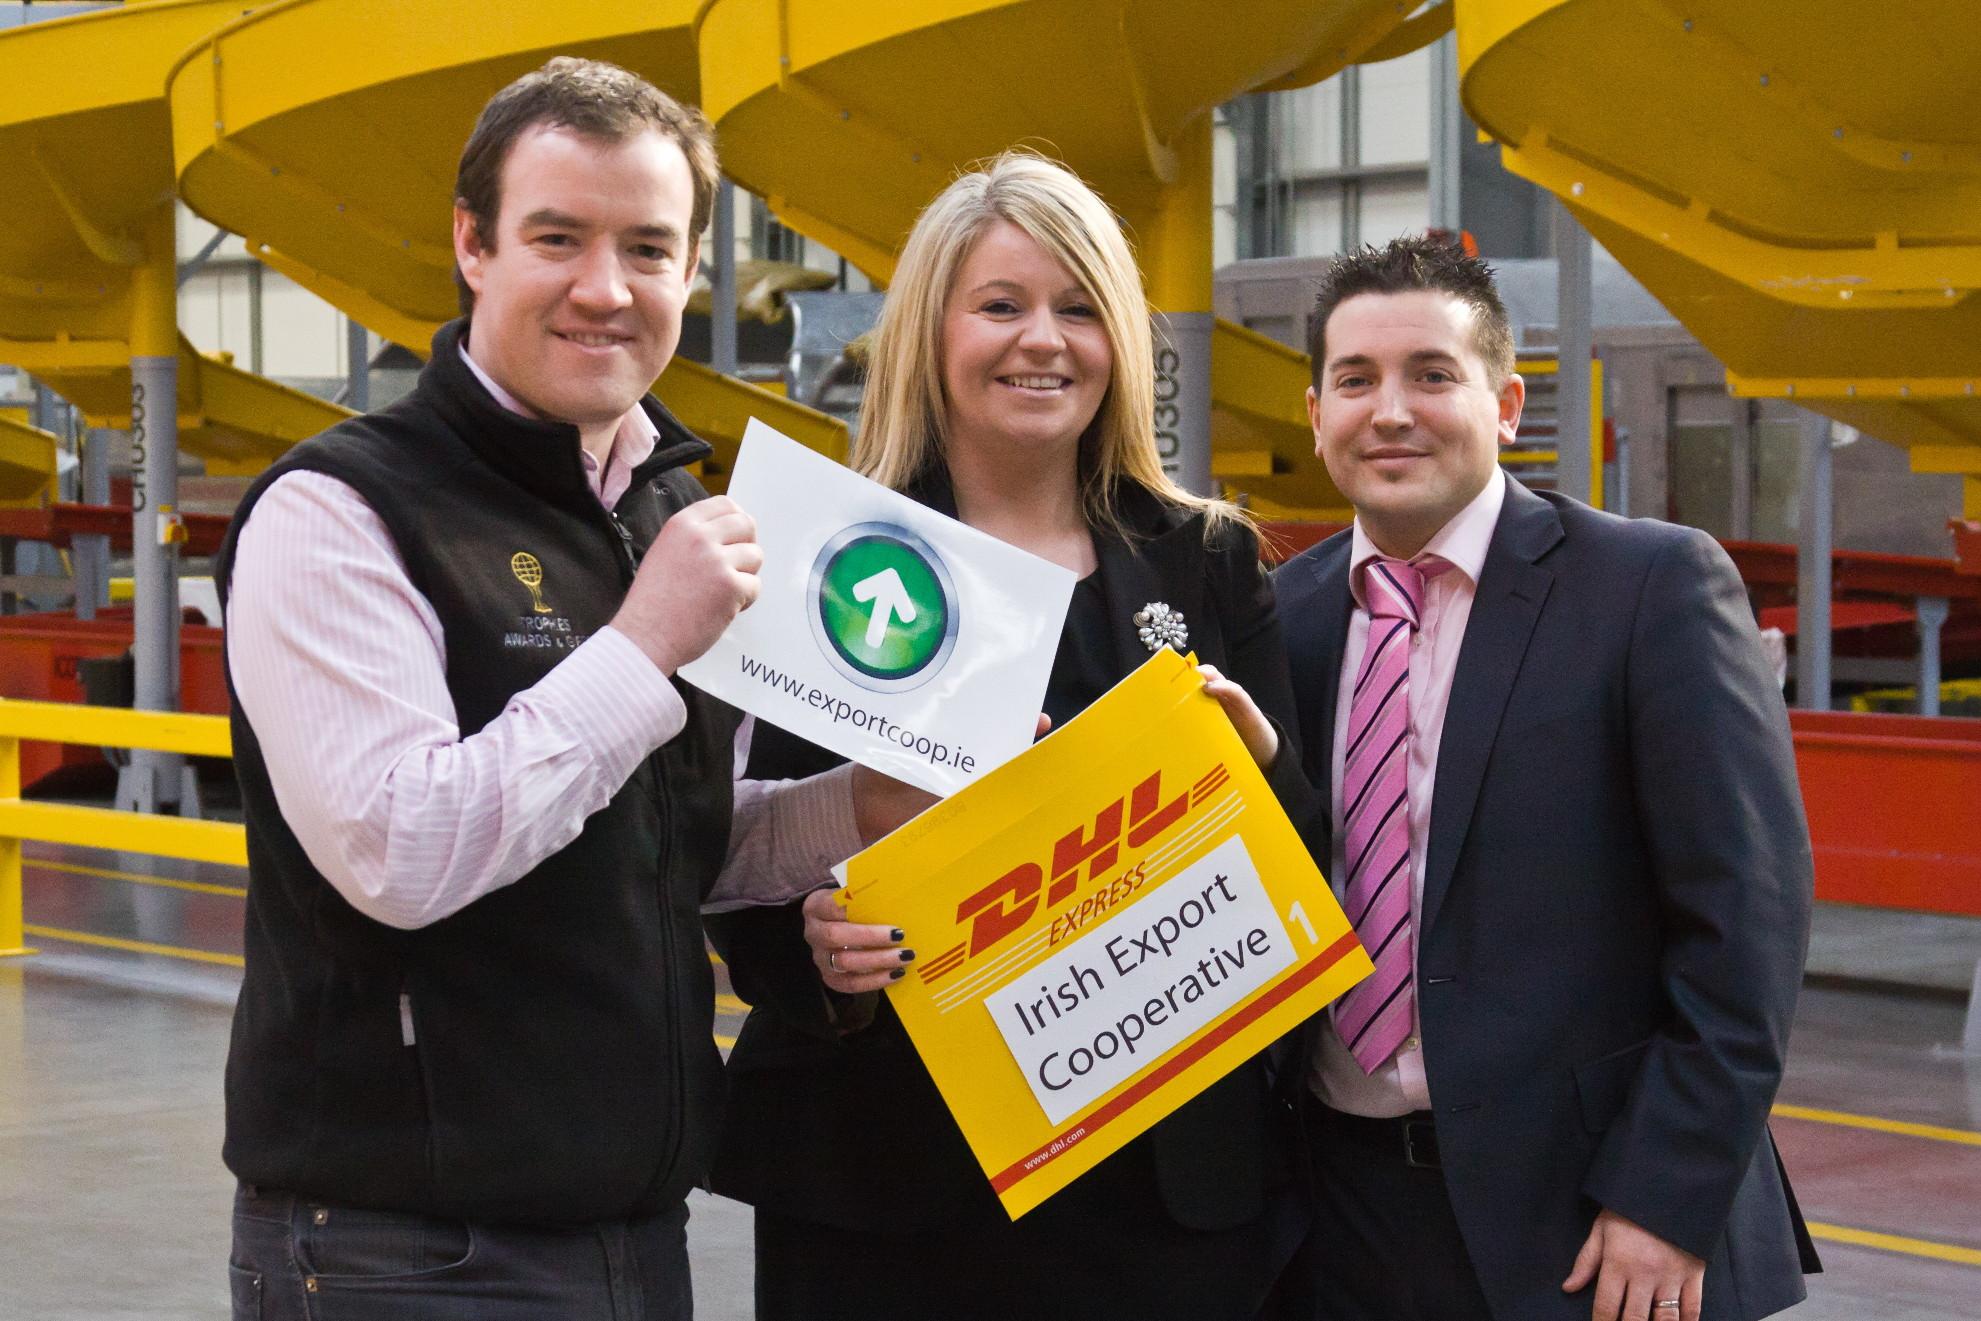 Irish Export Cooperative DHL